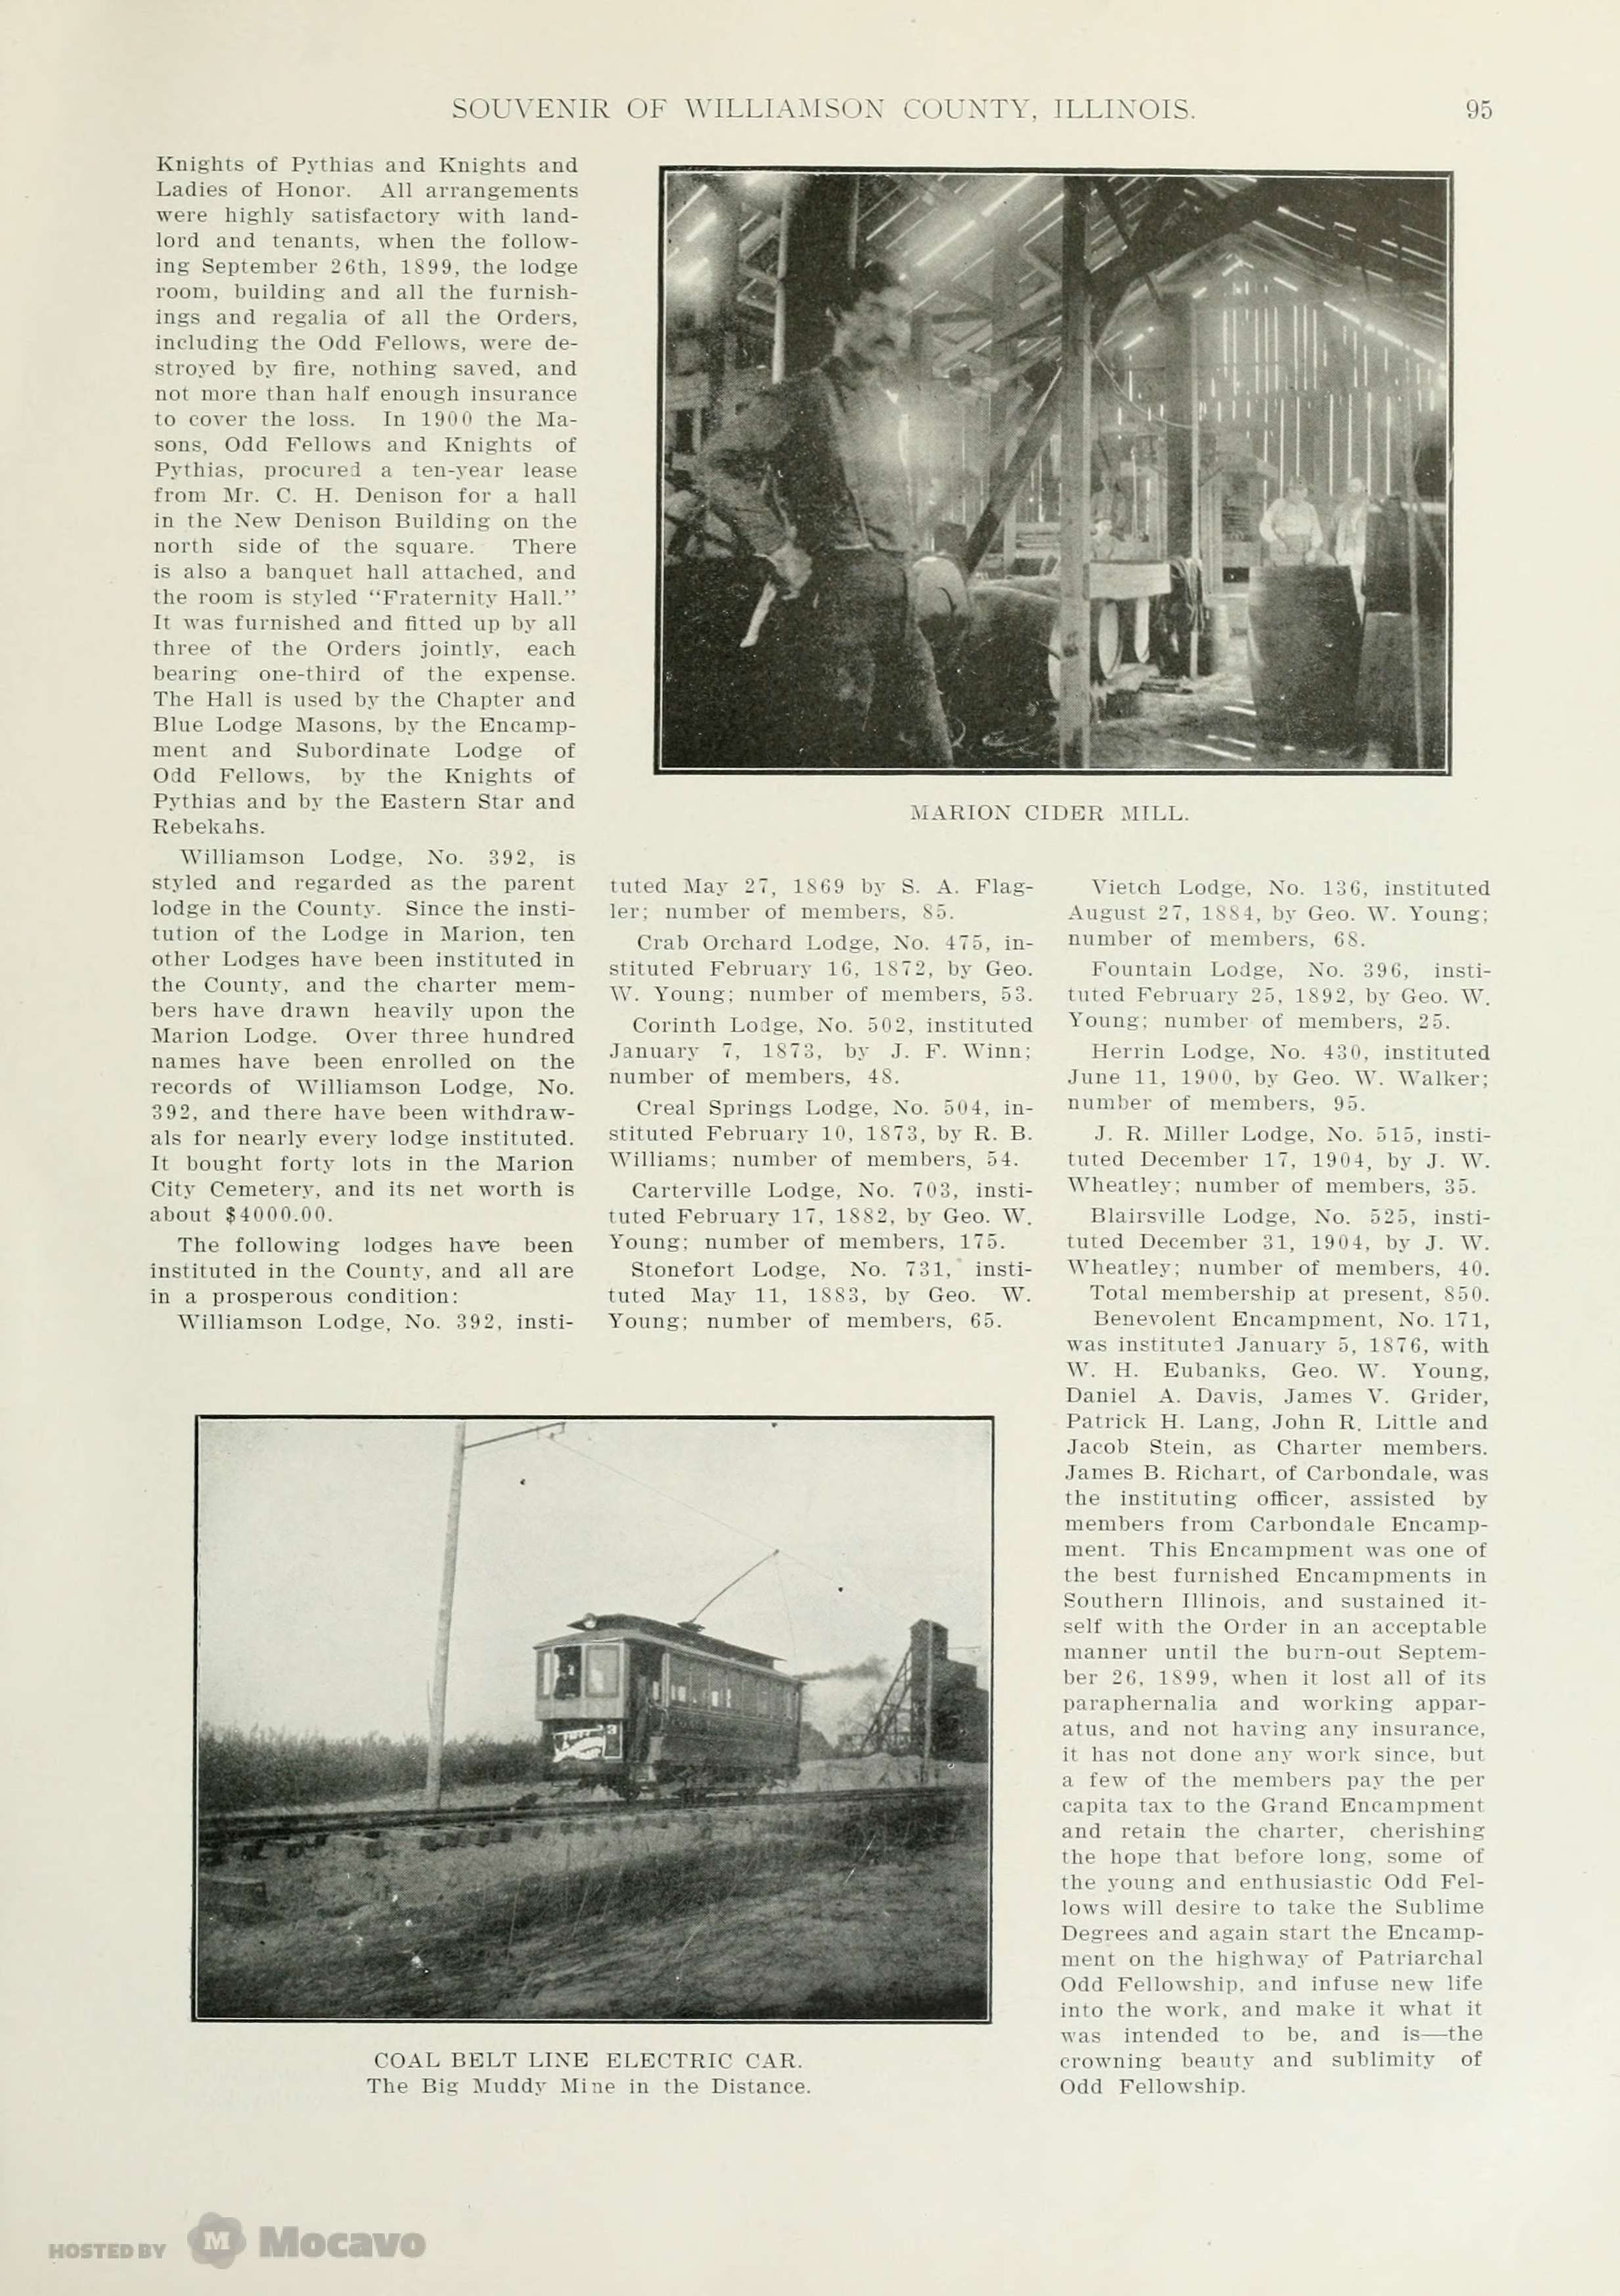 Historical Souvenir of Williamson County, Illinois, Page